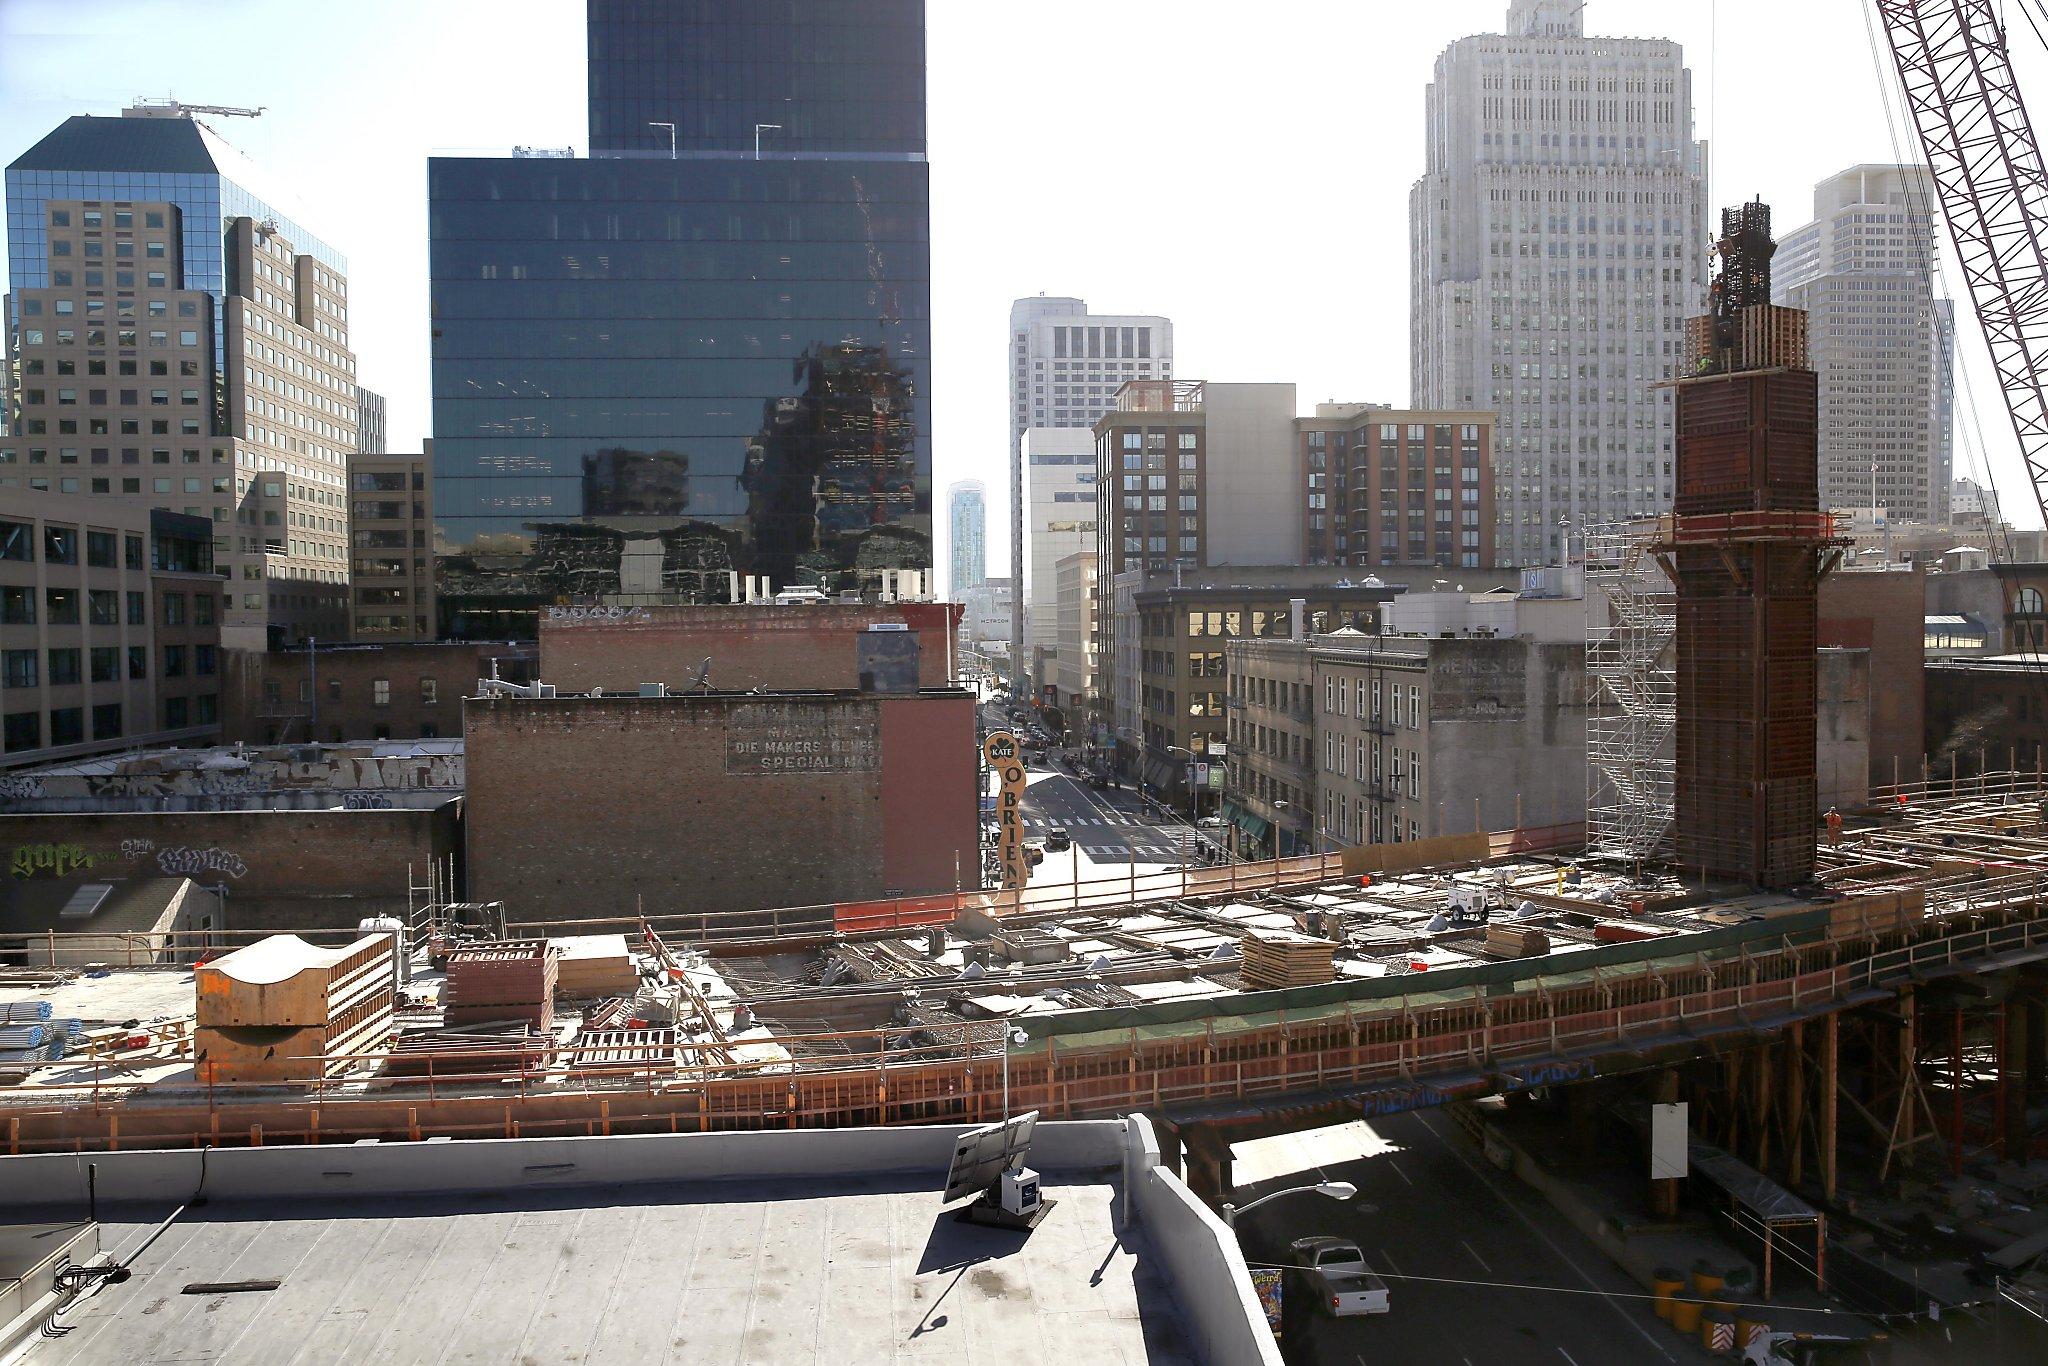 Starchitect Renzo Piano Has Designs On Howard Street